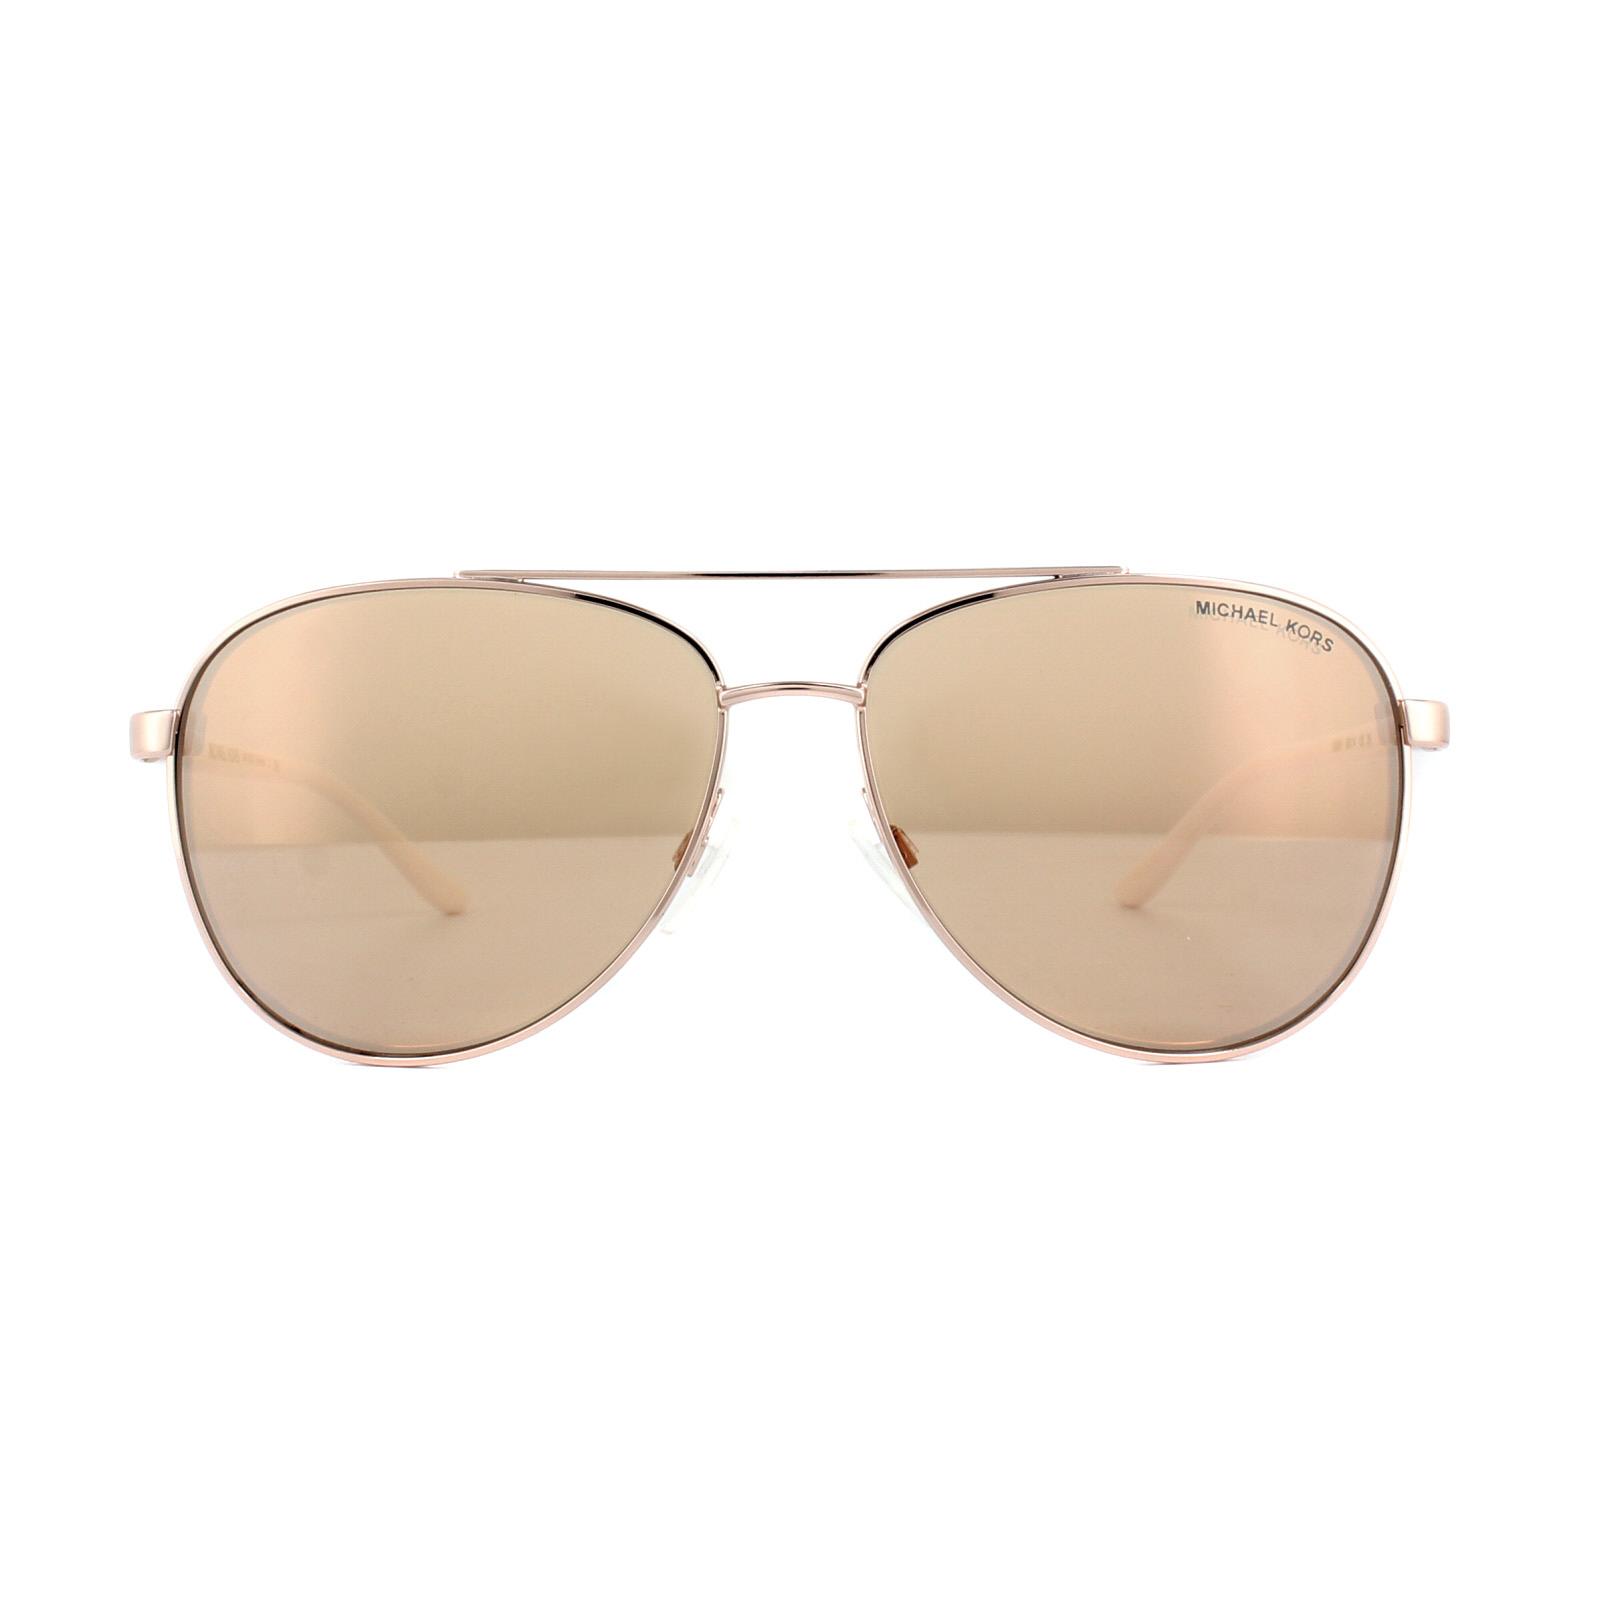 e058d7b62d michael kors benidorm sunglasses sale   OFF61% Discounted